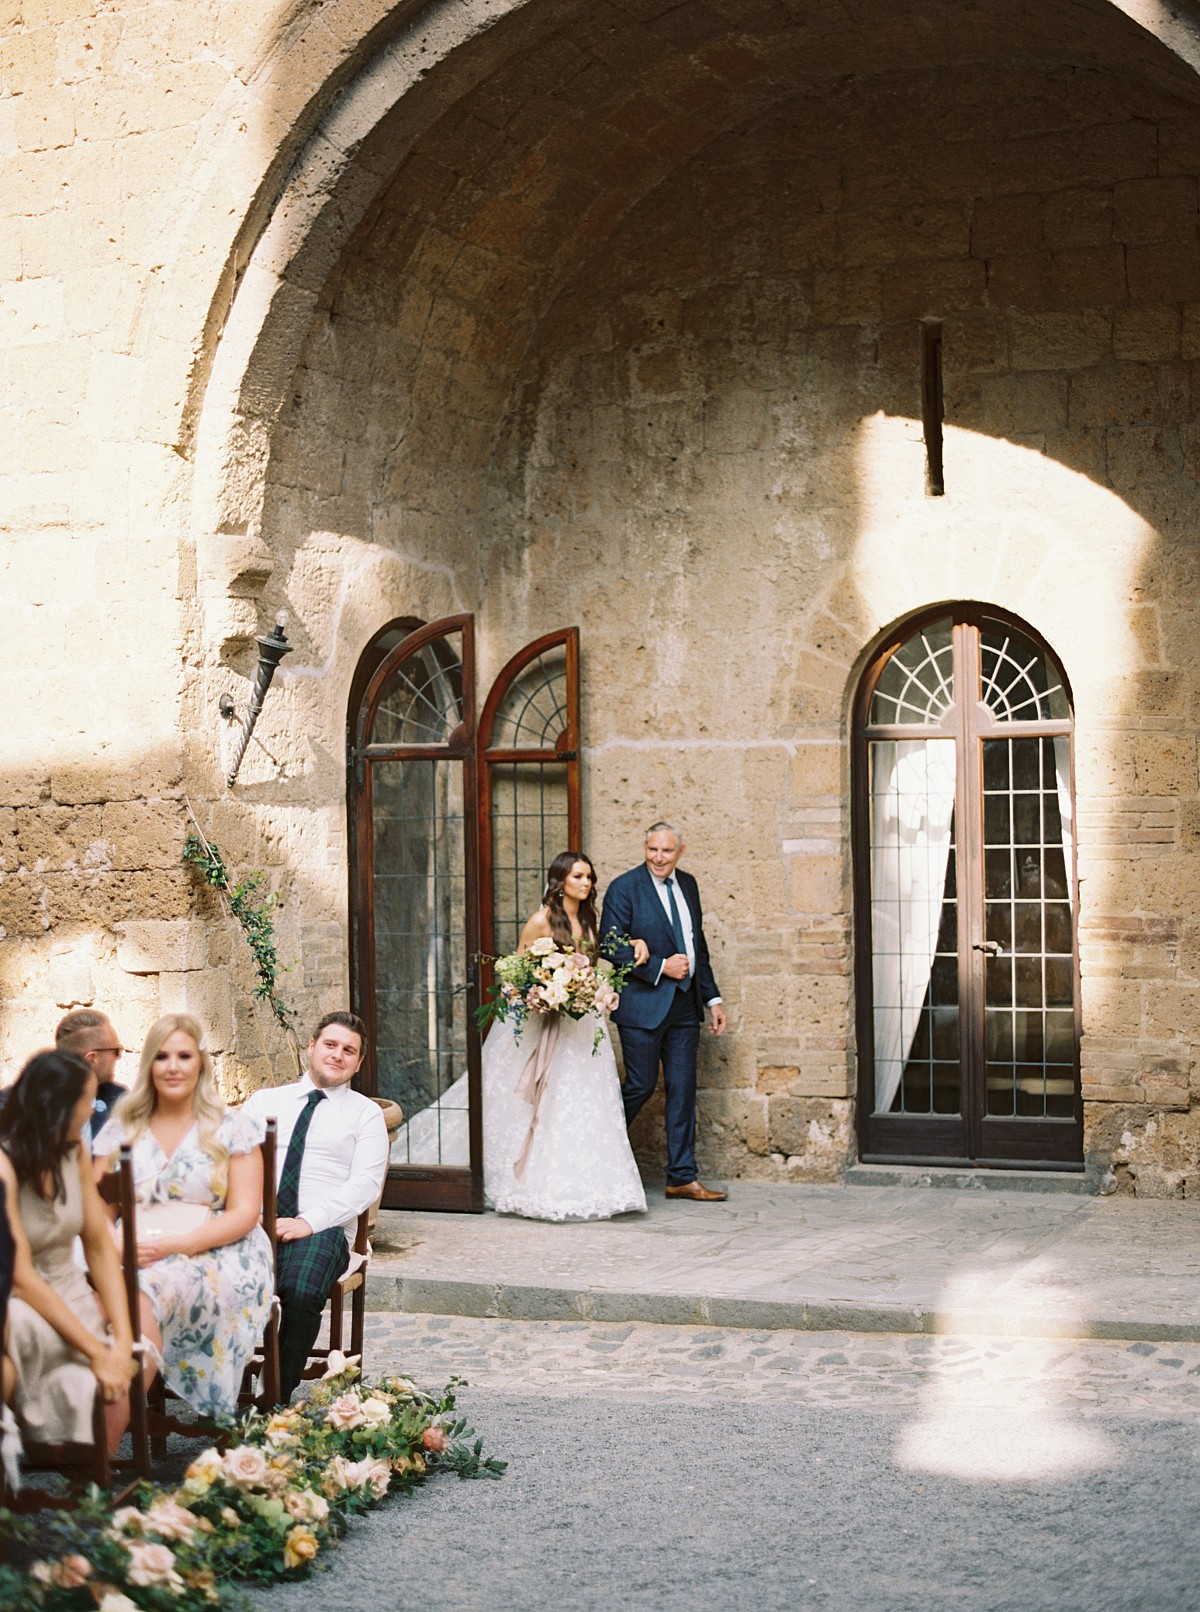 Stunning Italian wedding in crumbling medieval abbey